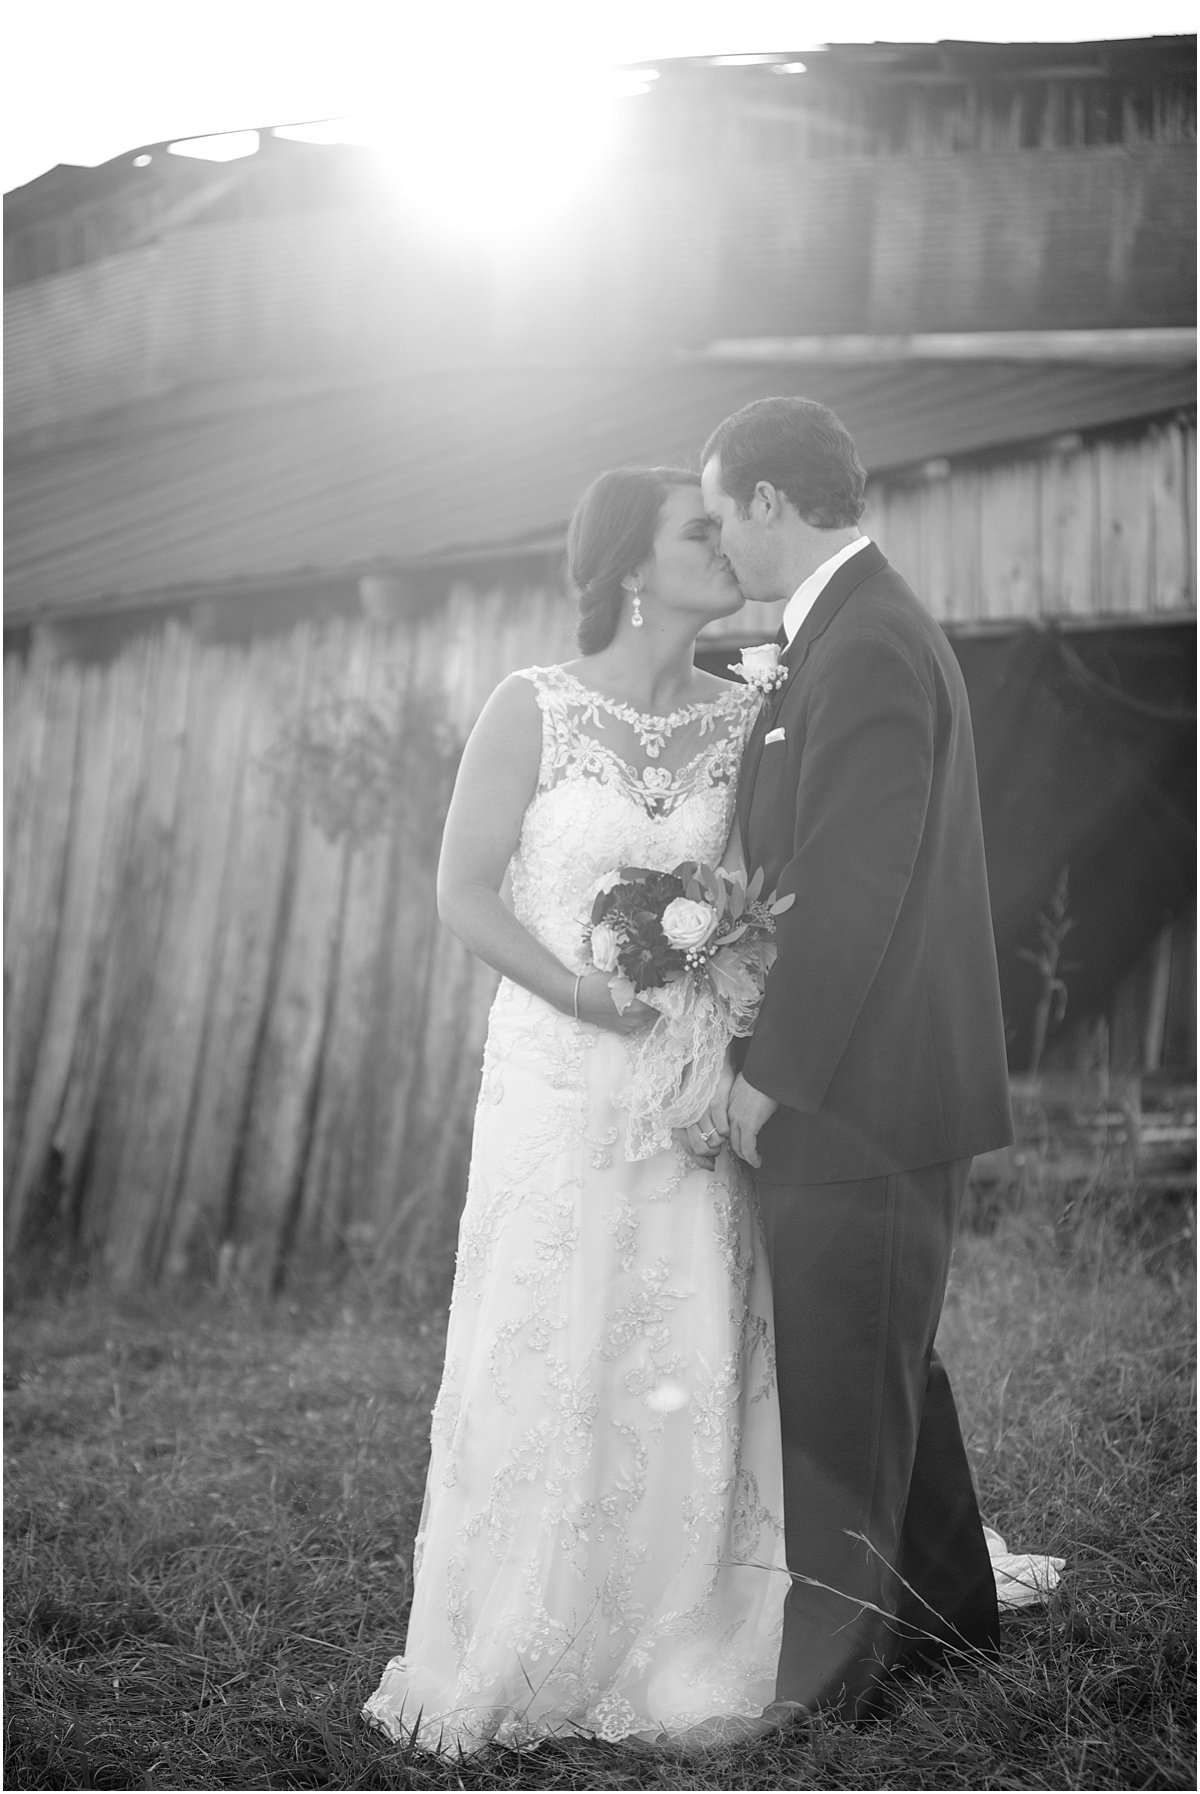 Greg Smit Photography Nashville wedding photographer Tomlinson Family Farm_0039